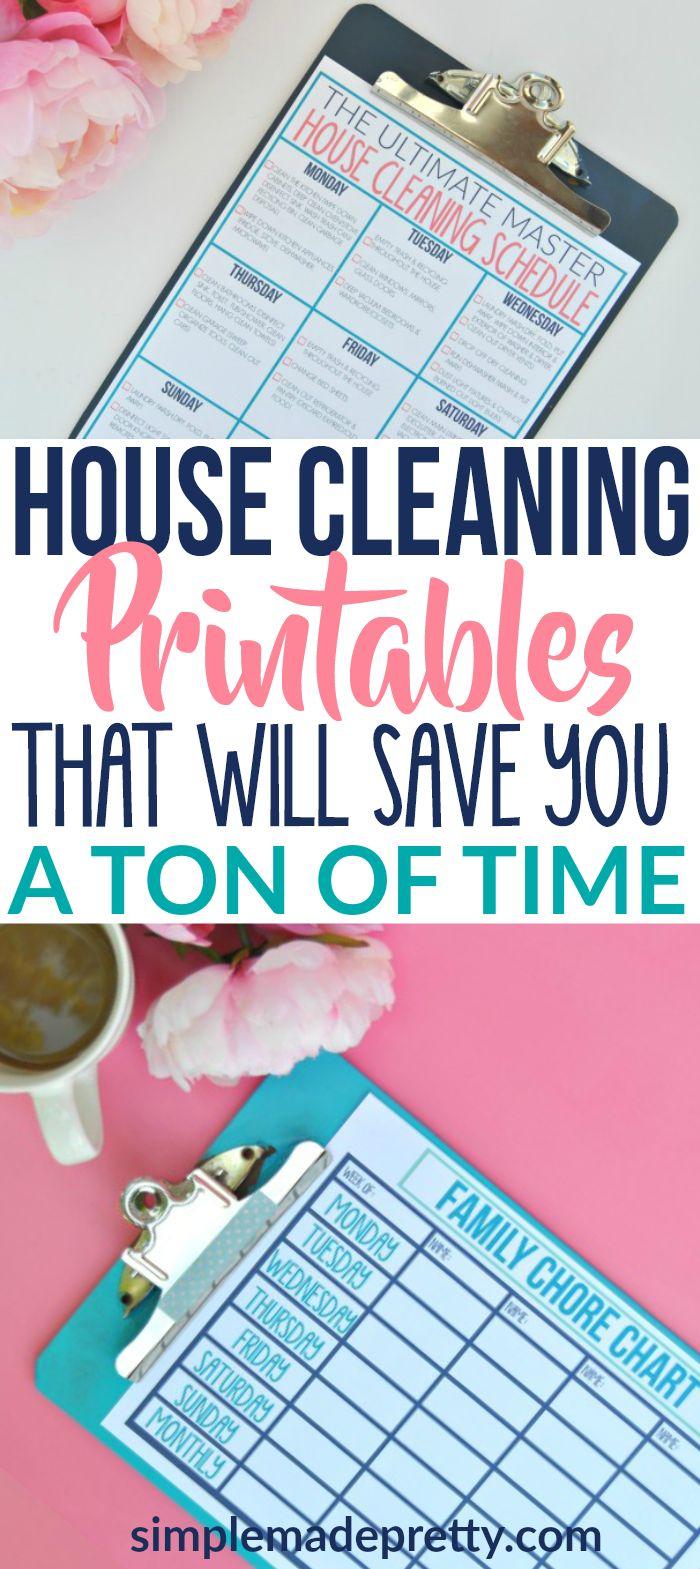 House cleaning checklist in spanish - Best 10 House Cleaning Checklist Ideas On Pinterest House Cleaning Schedules House Cleaning Charts And Cleaning Checklist